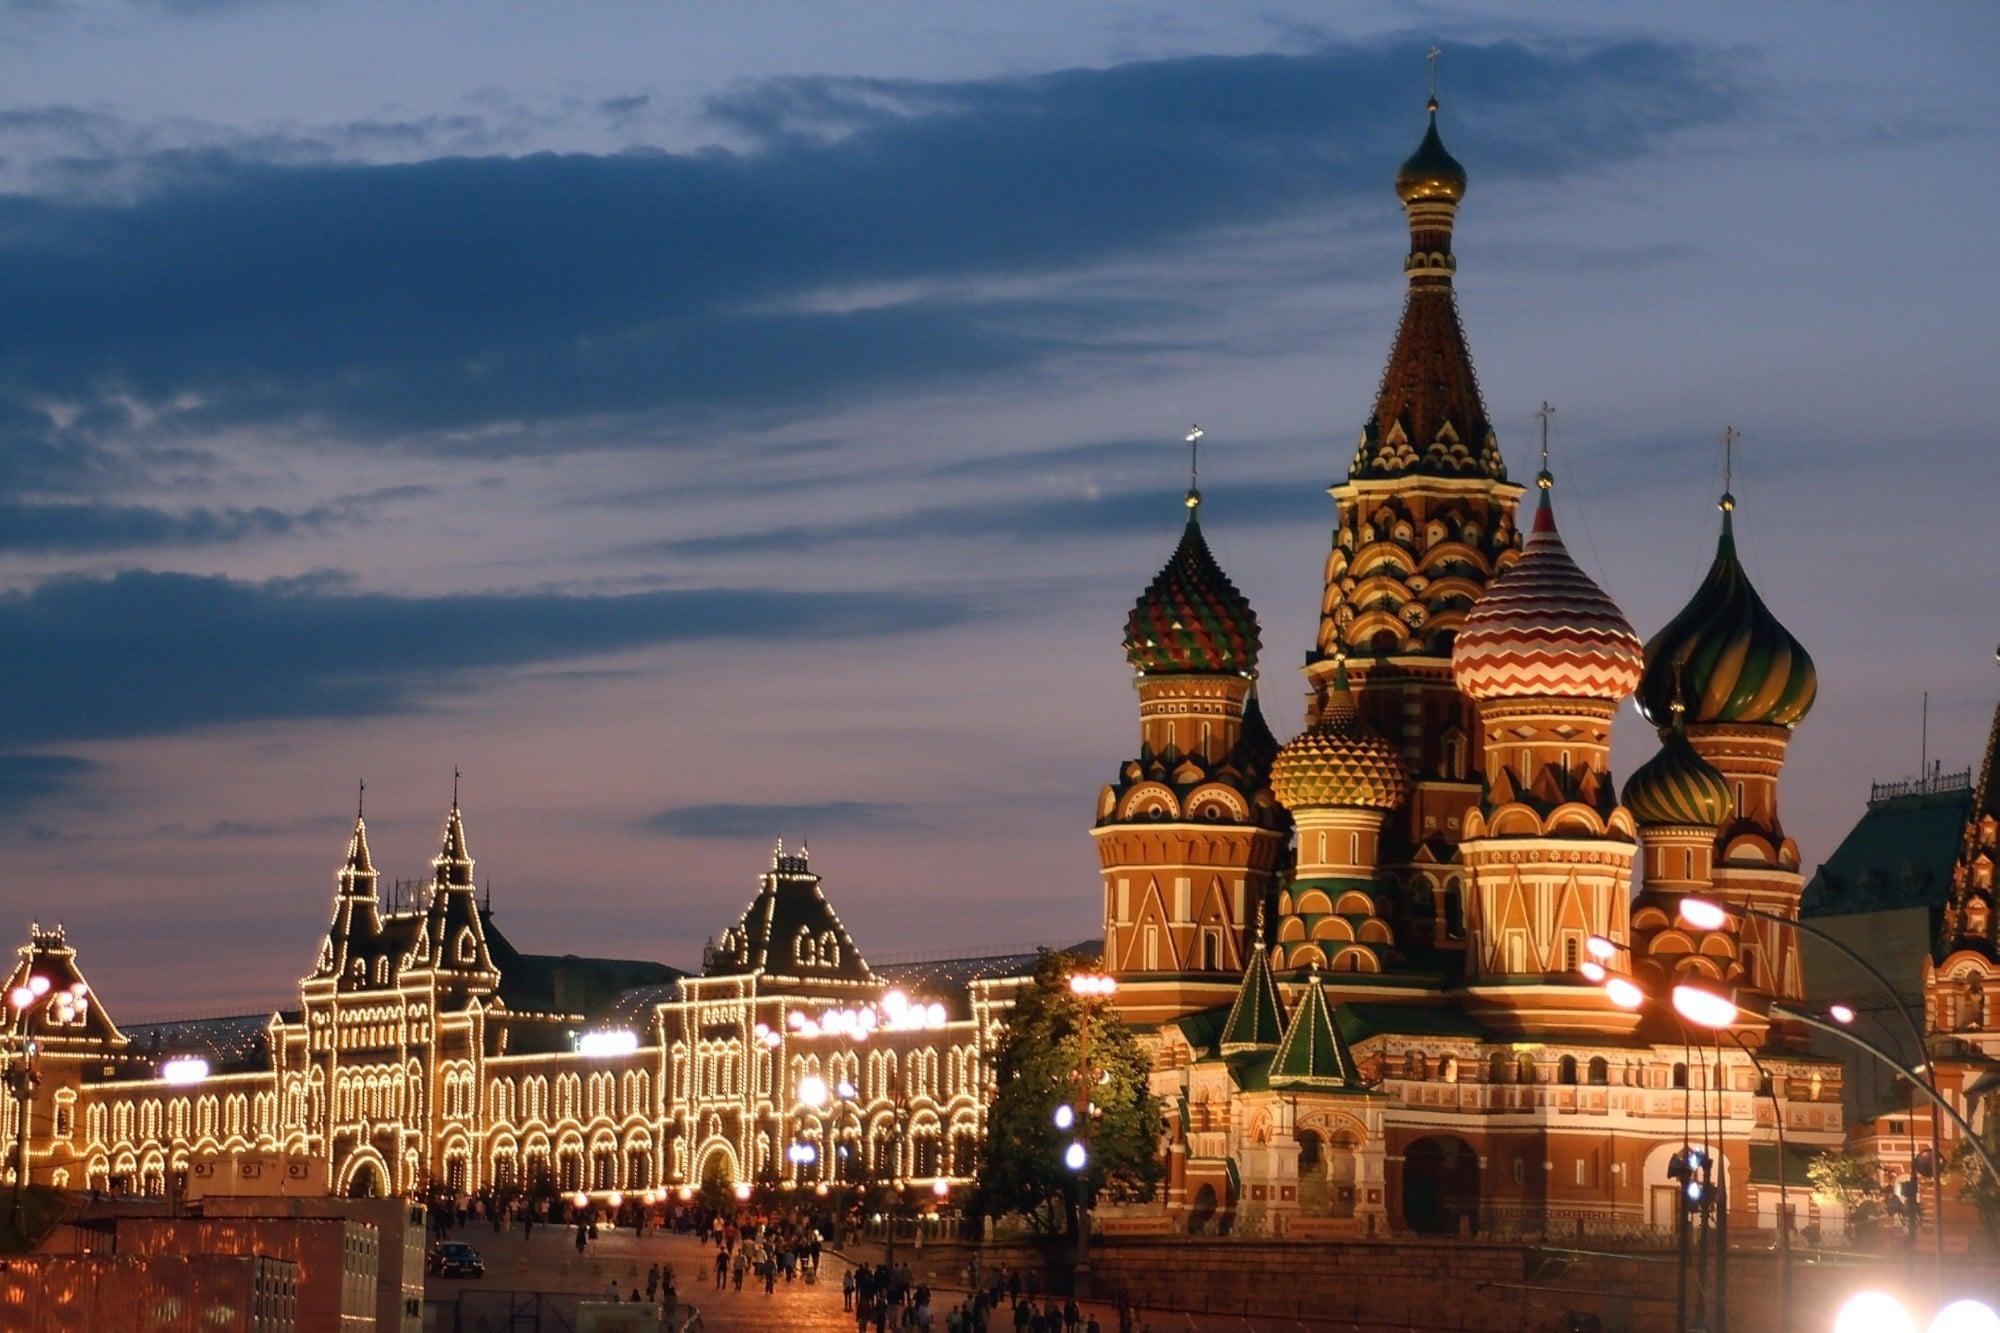 Rusya denince akla gelenler